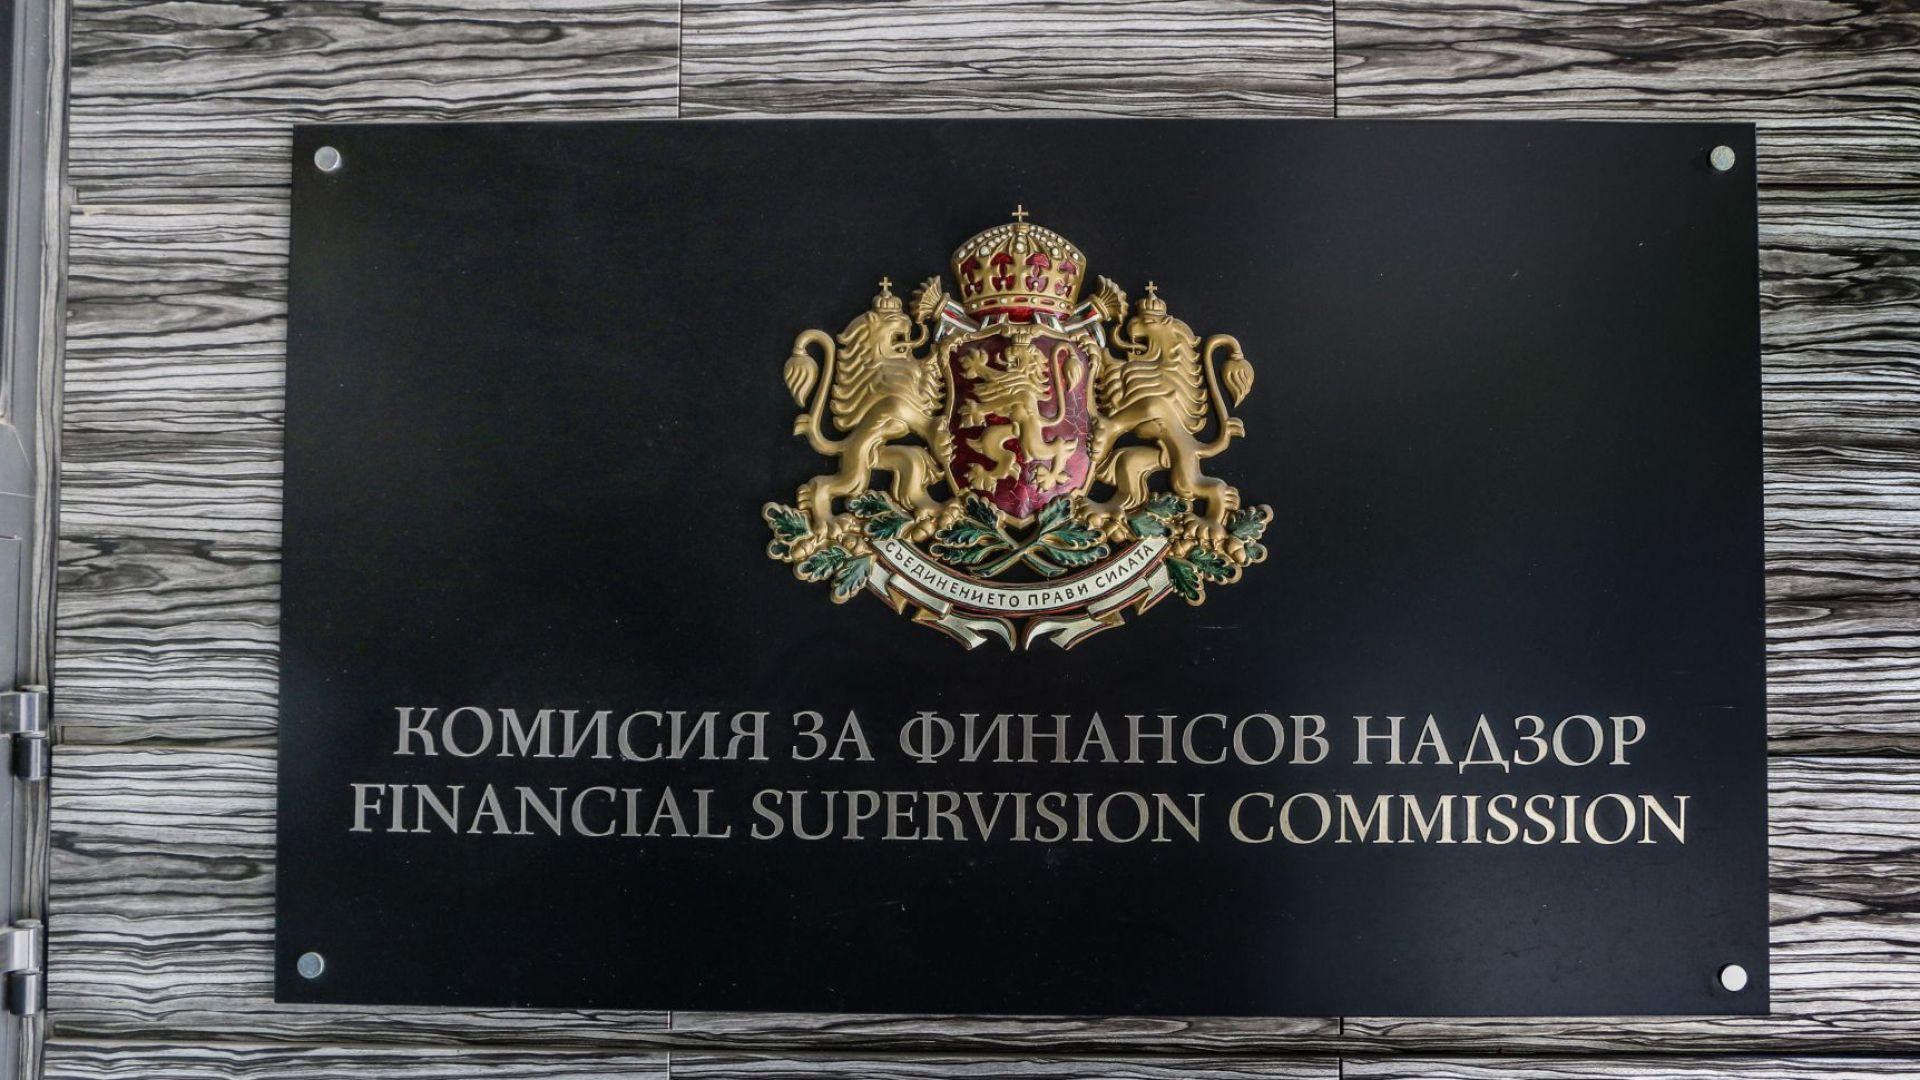 Парламентът откри процедура за избор на двама нови зам.-председатели на КФН